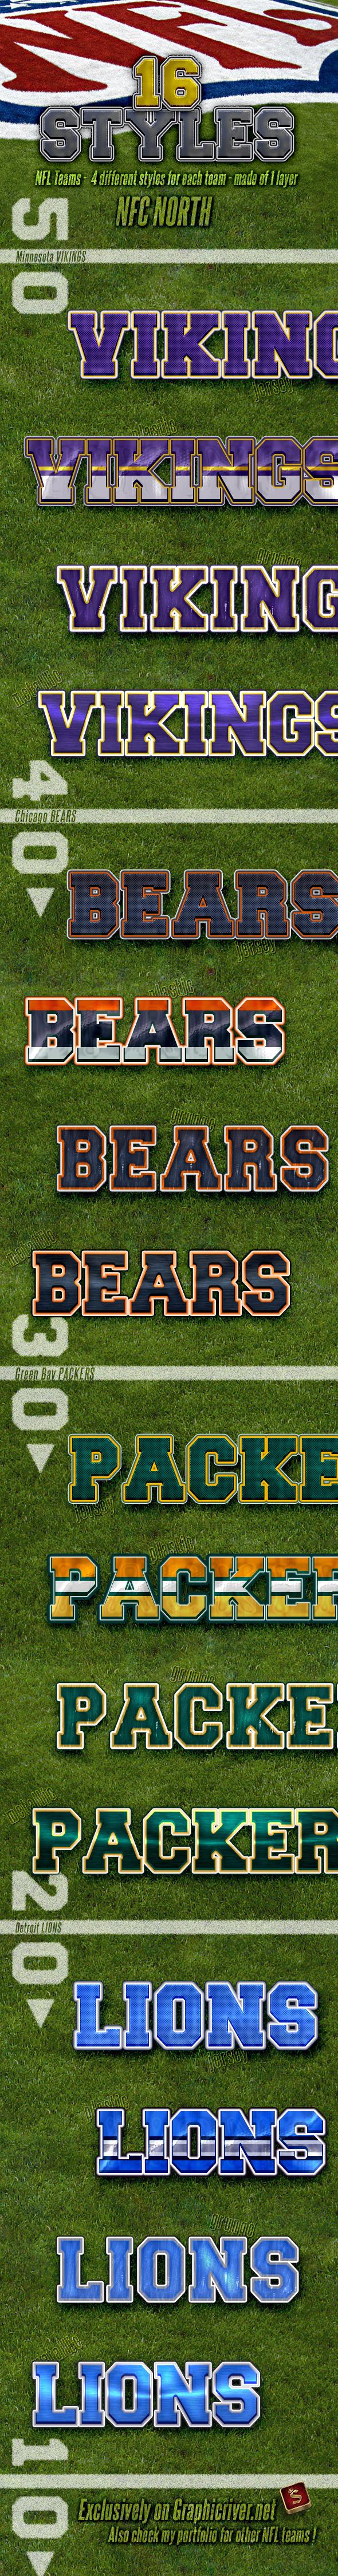 NFL Football Styles - NFC North - Styles Photoshop